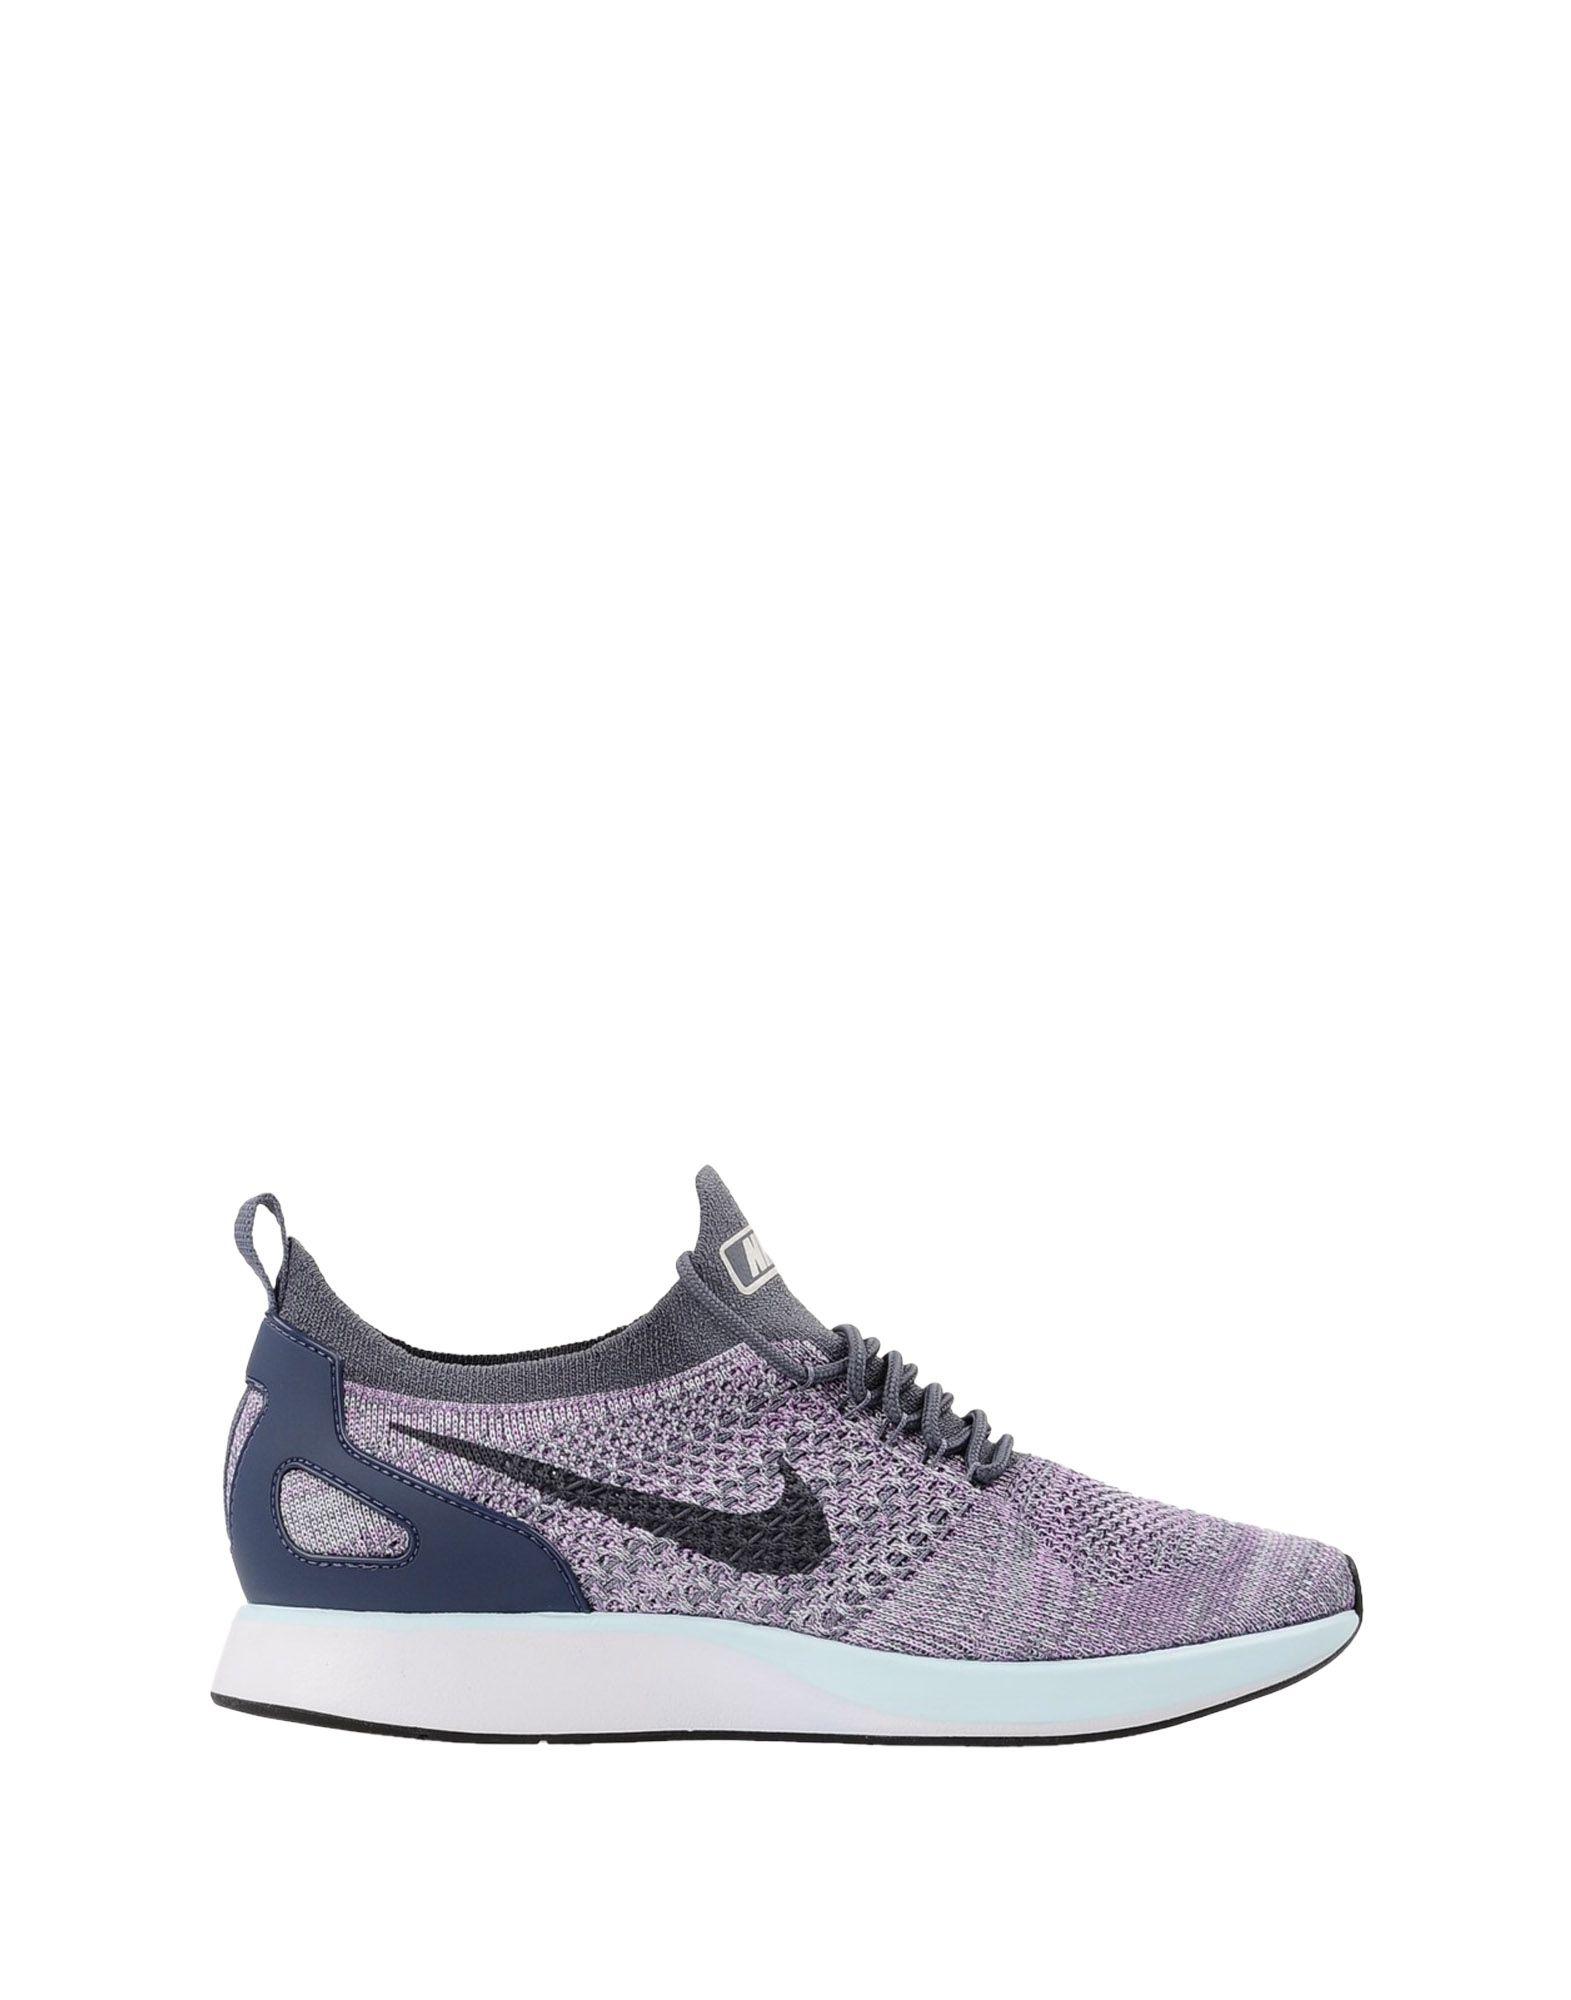 Nike Air Zoom Mariah Fk Racer  11431697JJ Heiße Schuhe